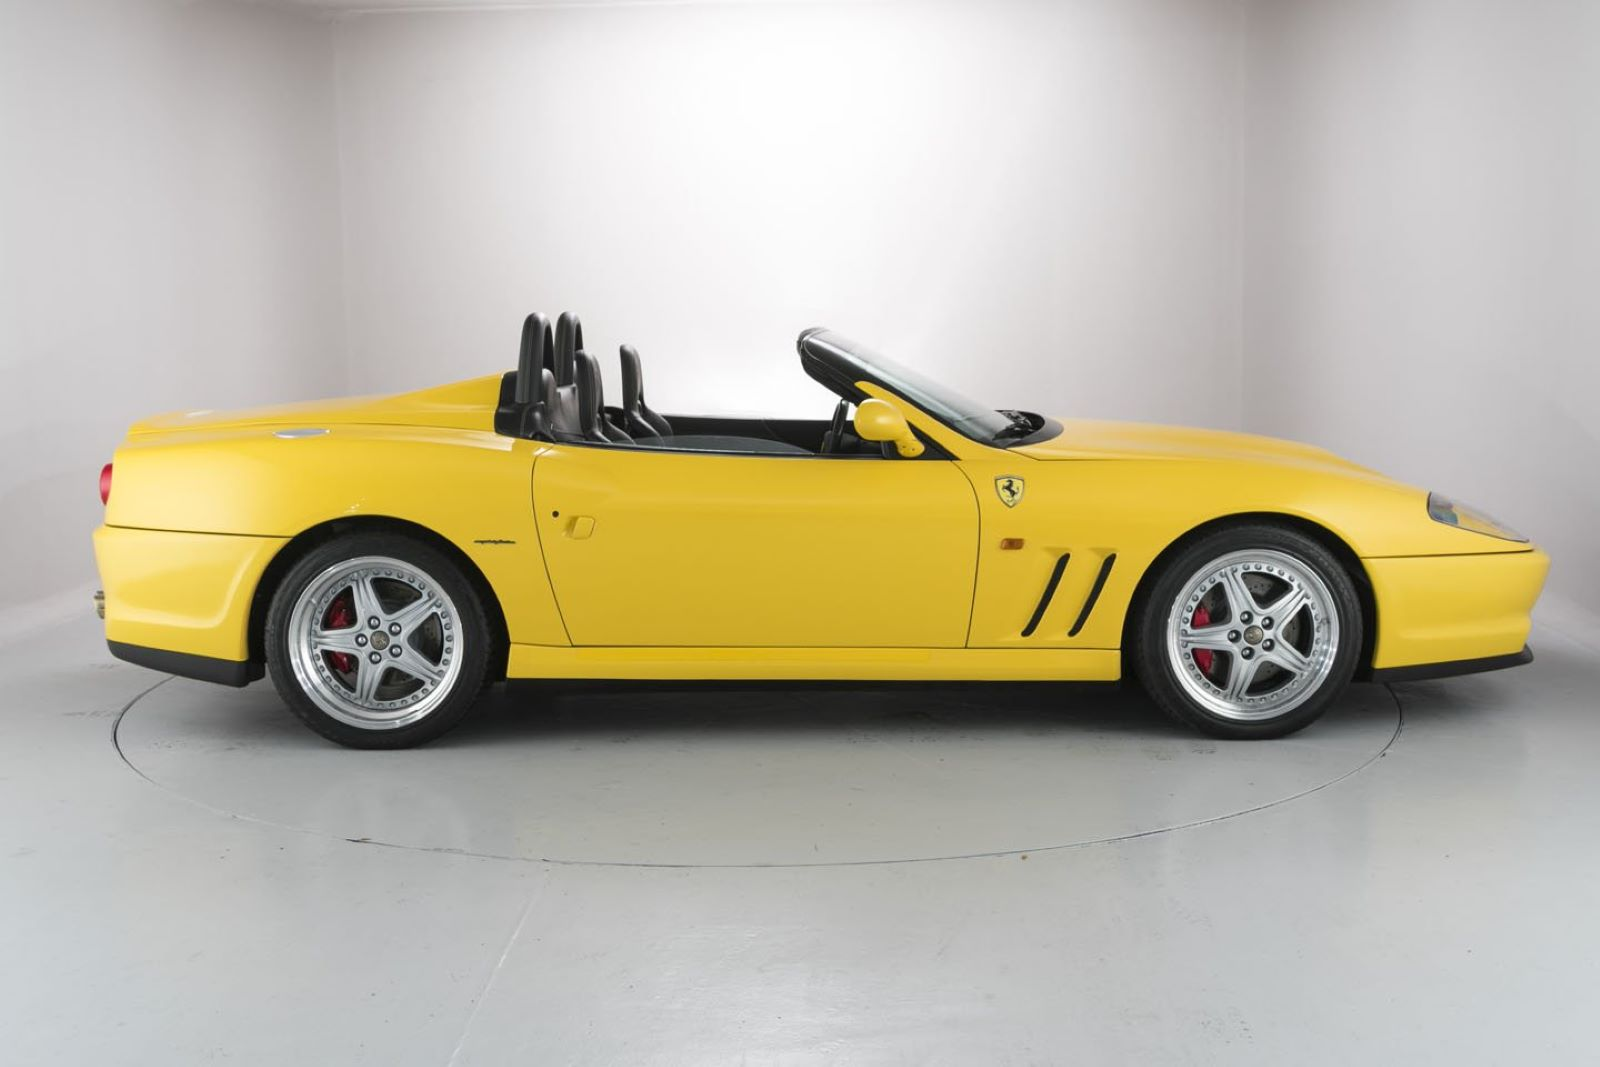 Ferrari 550 Barchetta Pininfarina - bok, profil